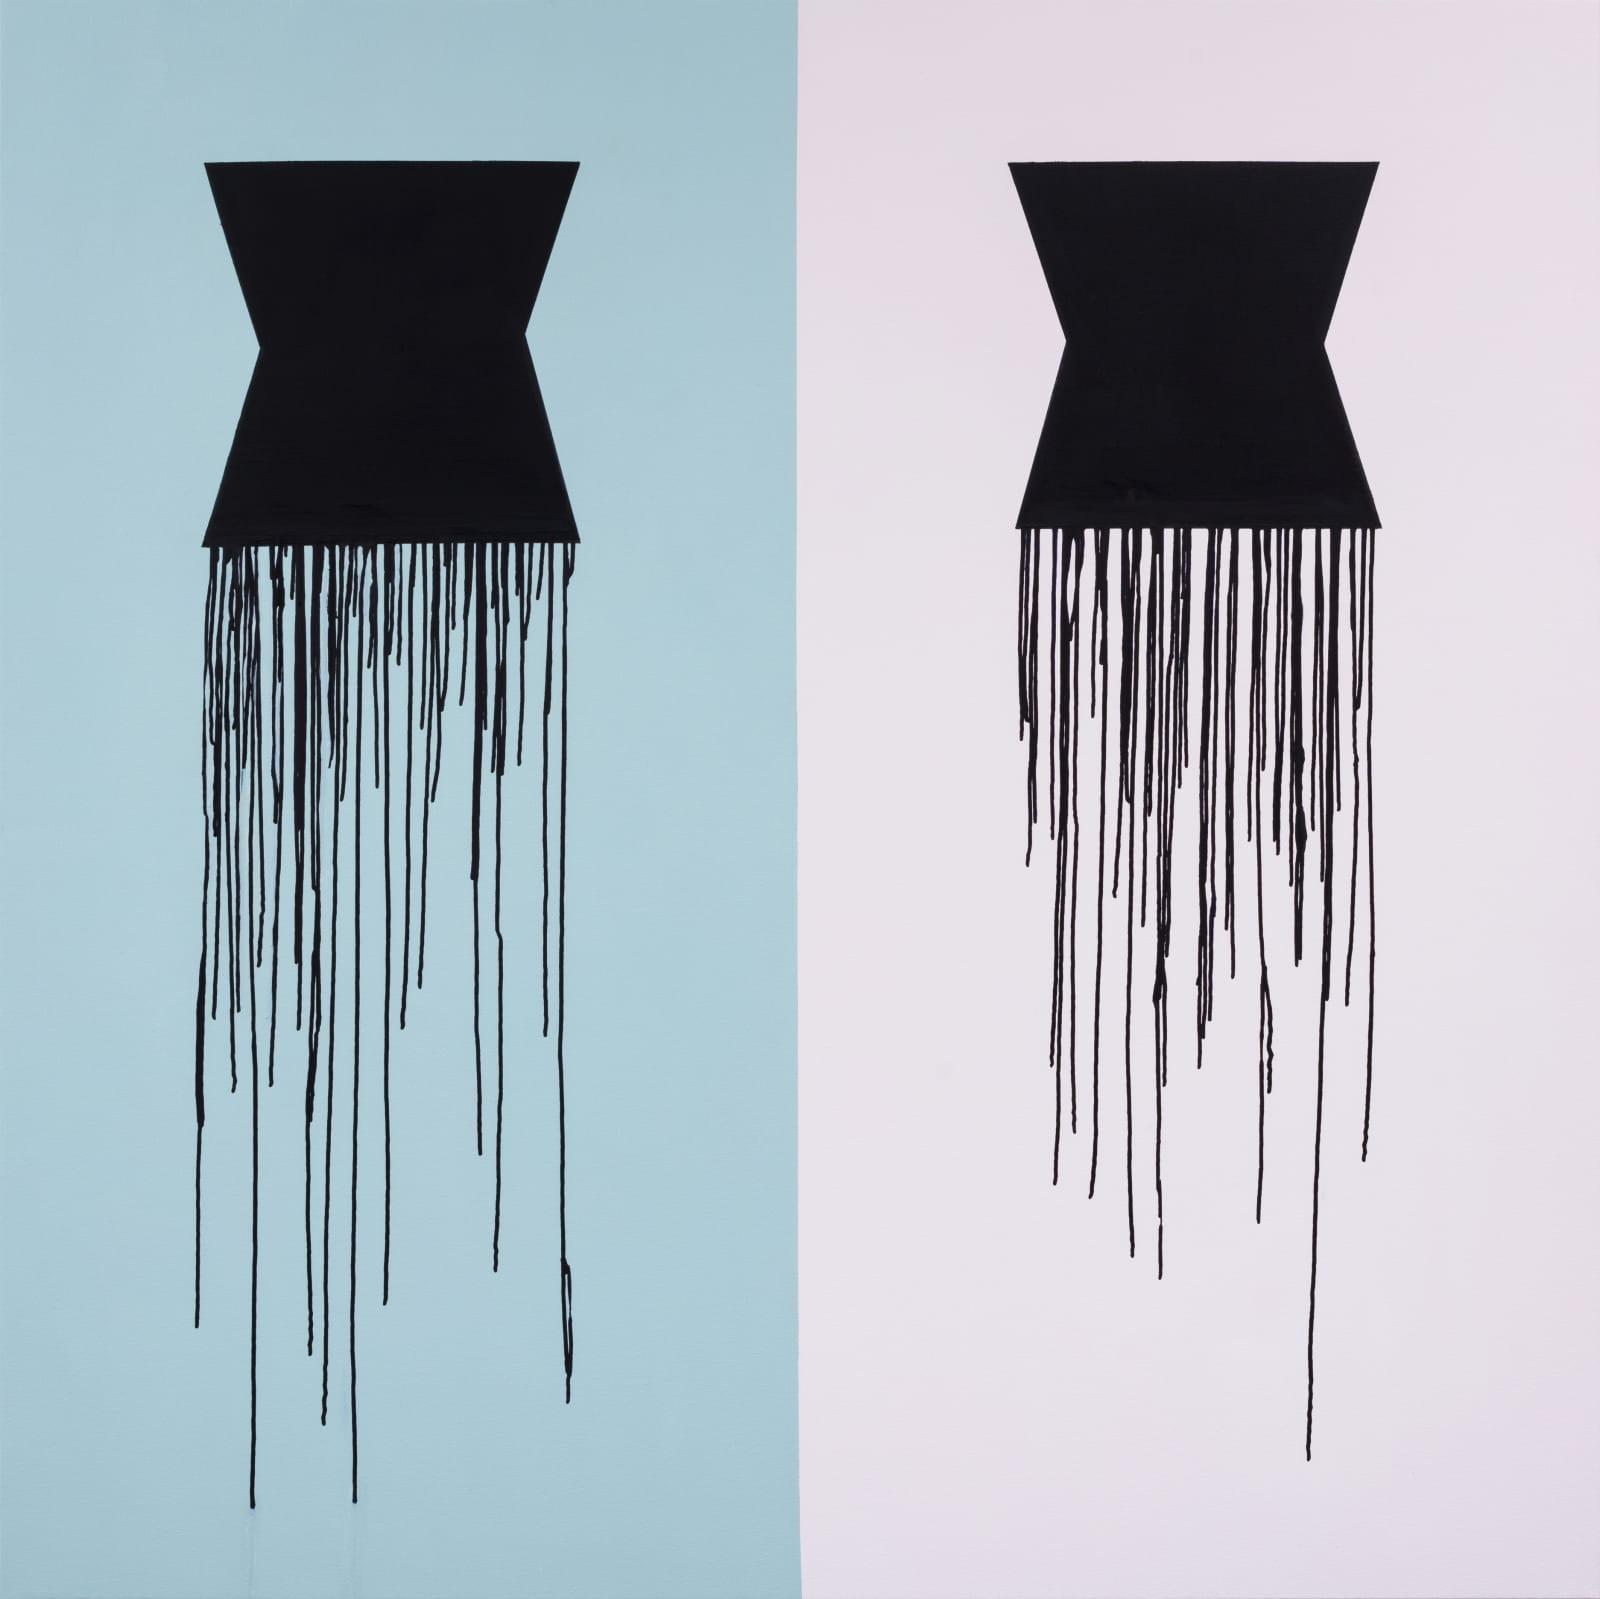 Julie Umerle, Split Infinity III, 2020